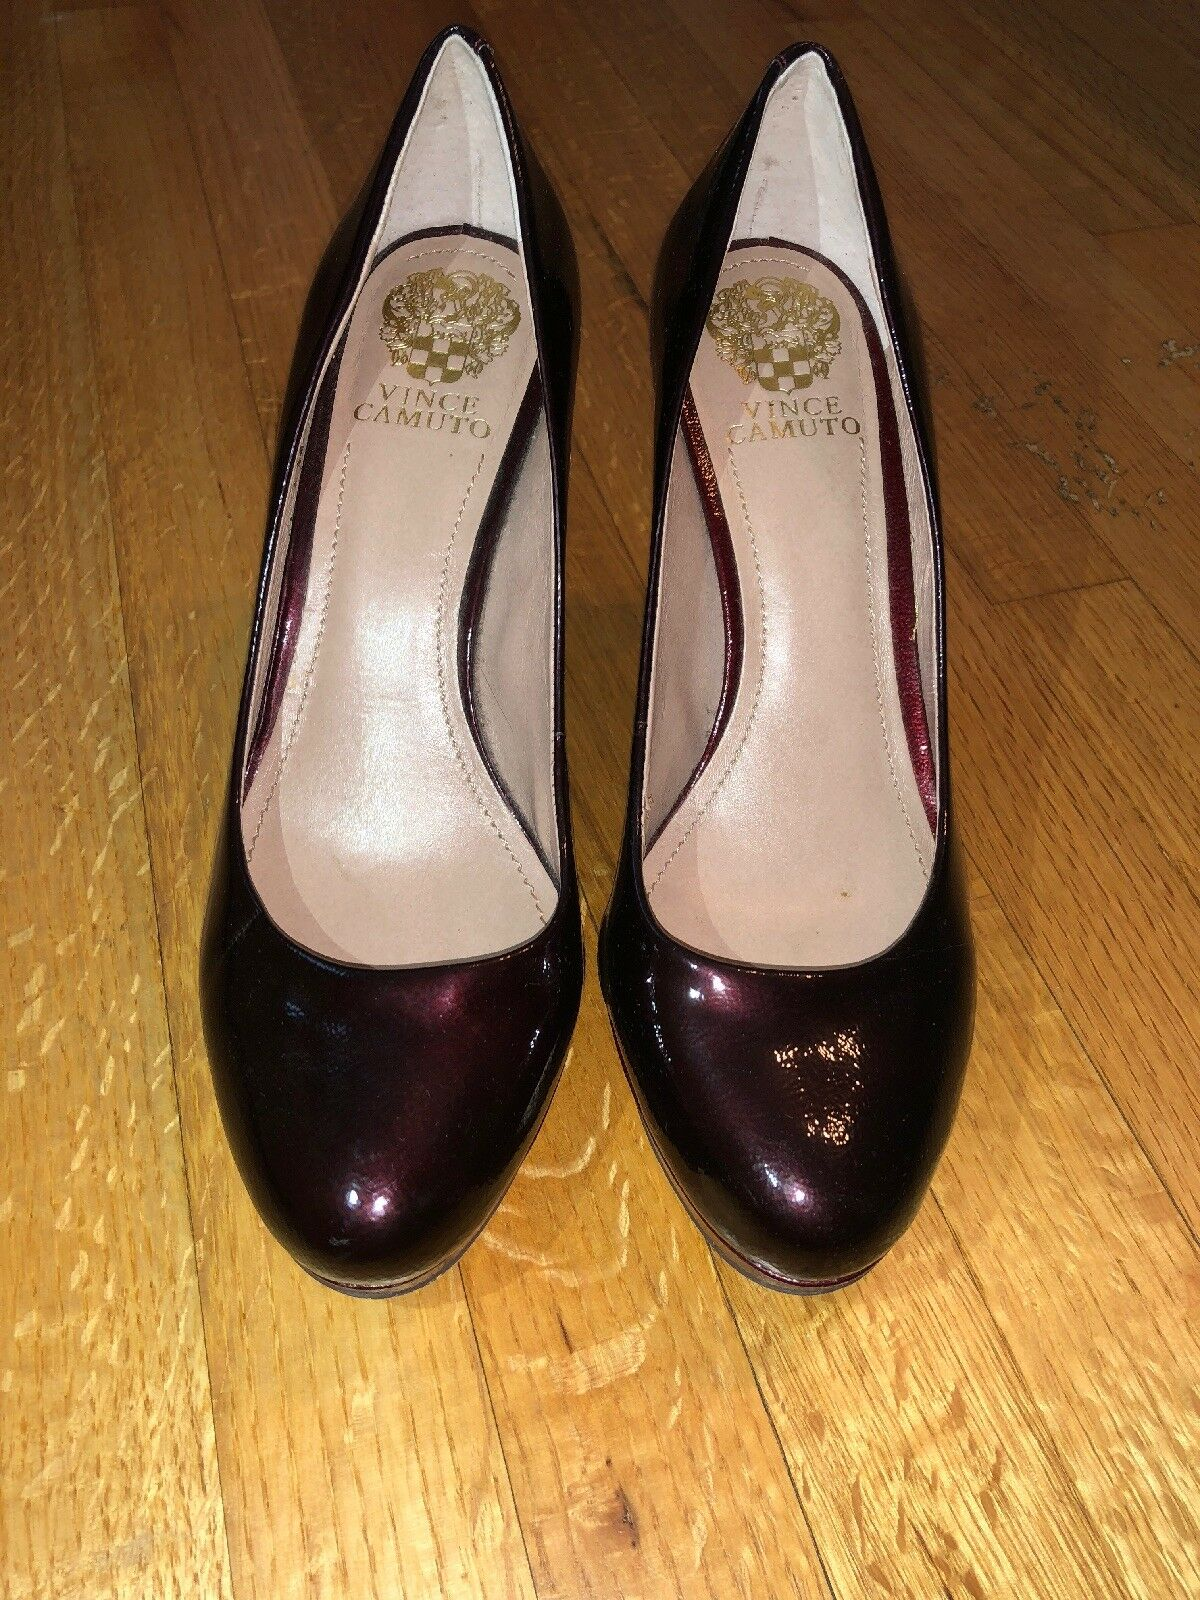 Vince Camuto damen Größe 8.5 8.5 8.5 Sarika Burgundy Patent Leather Platform Pumps  118 ff6c40